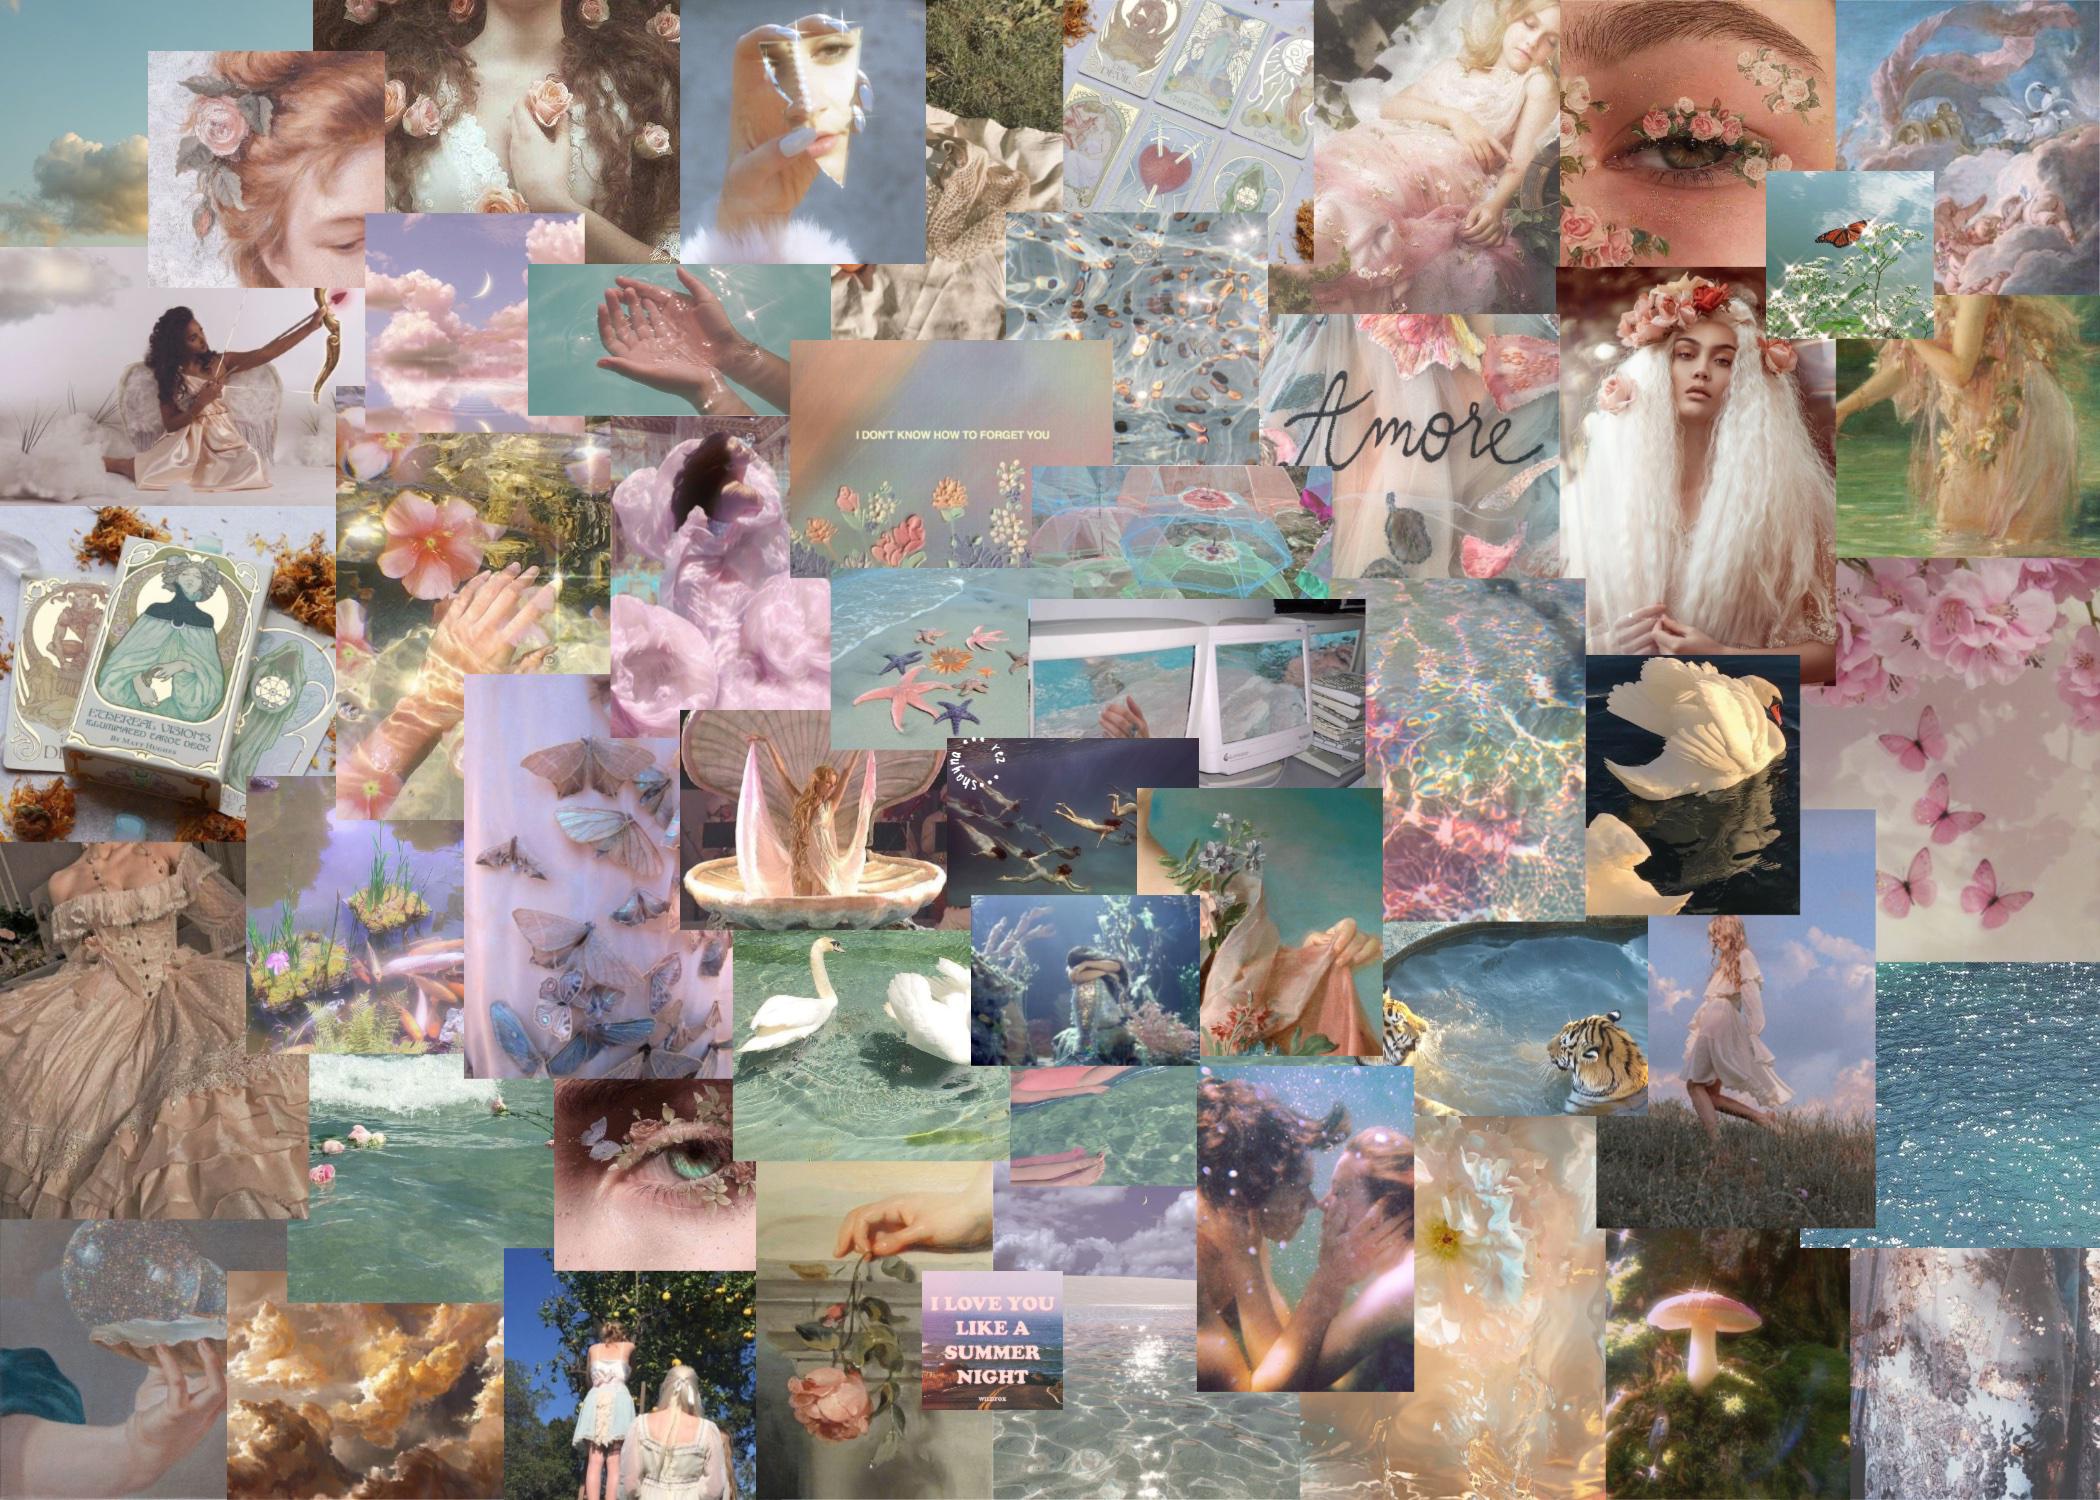 ethereal aesthetic laptop wallpaper in 2020 Aesthetic